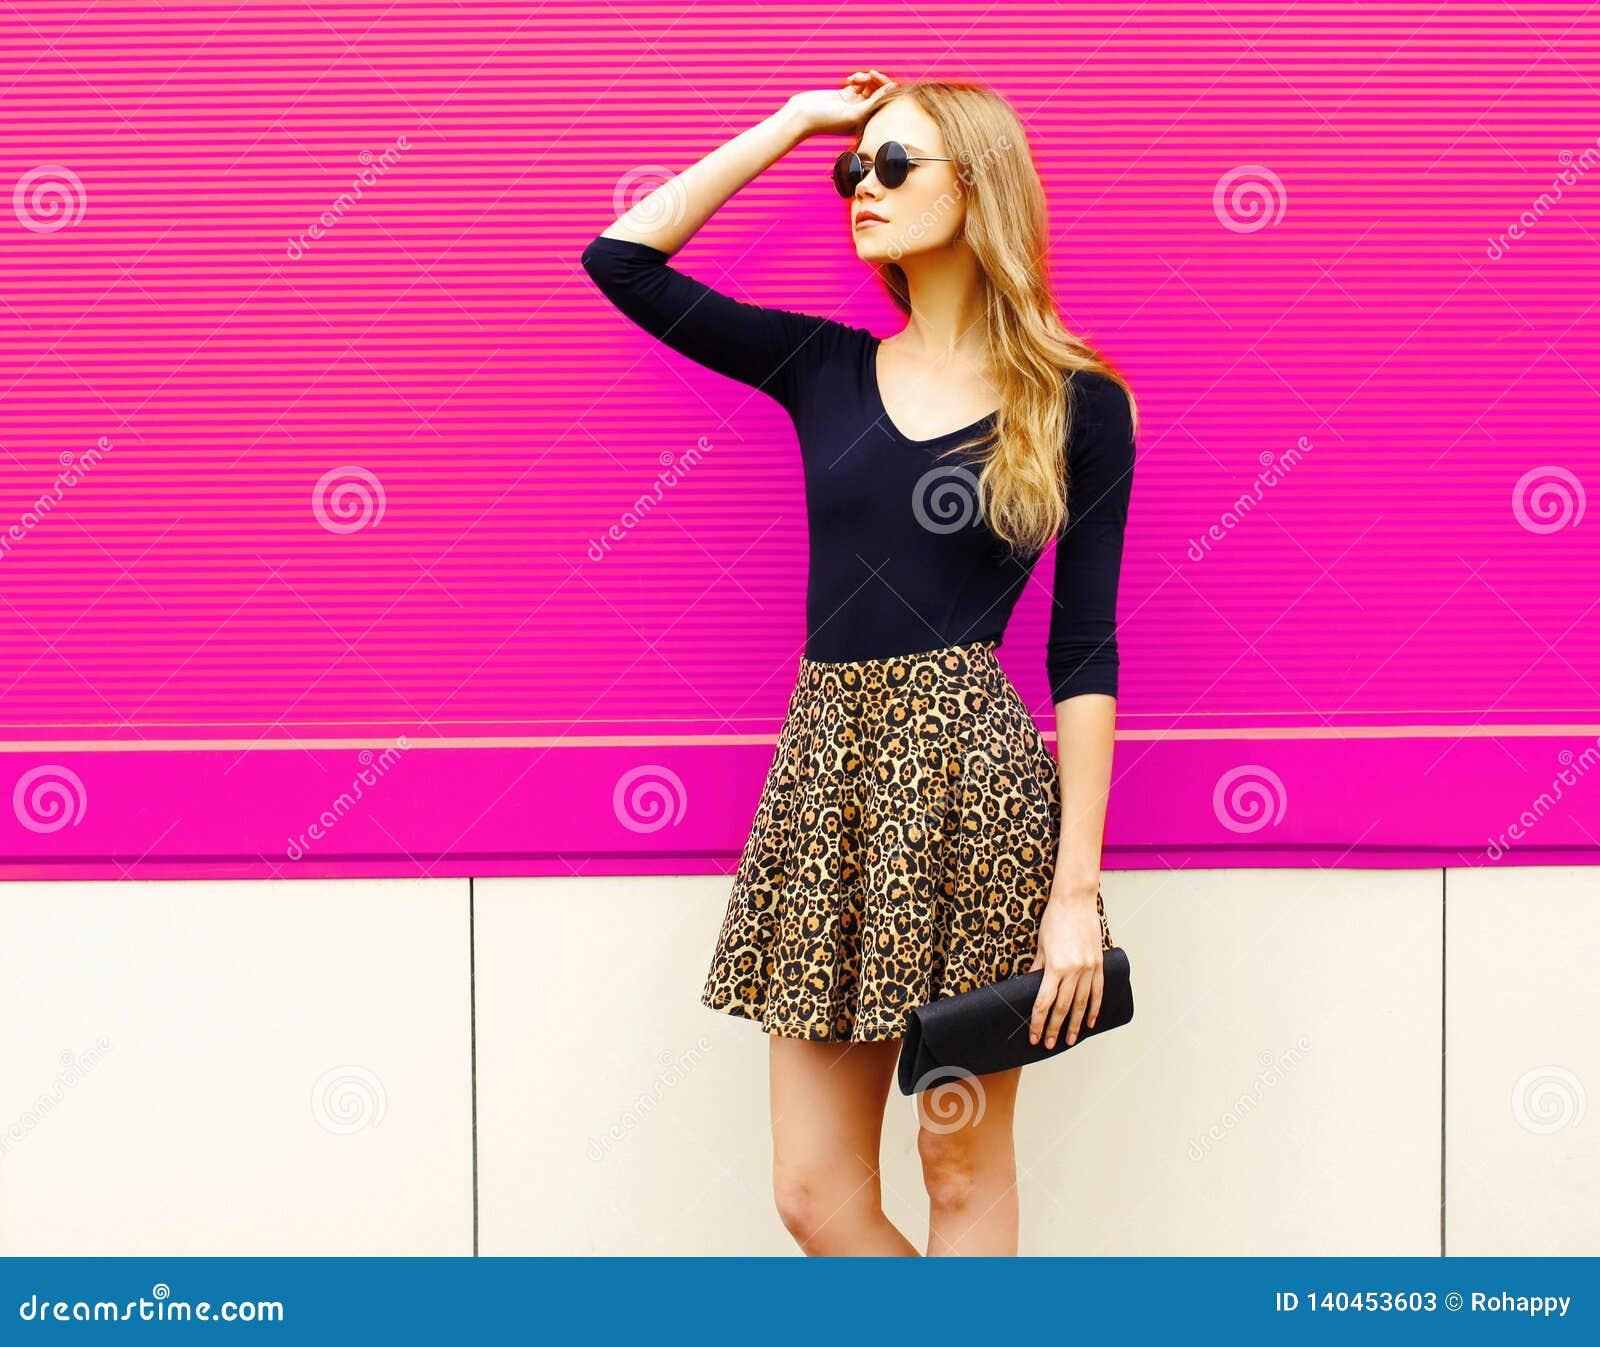 Portrait beautiful blonde woman model posing in leopard skirt, sunglasses with handbag clutch